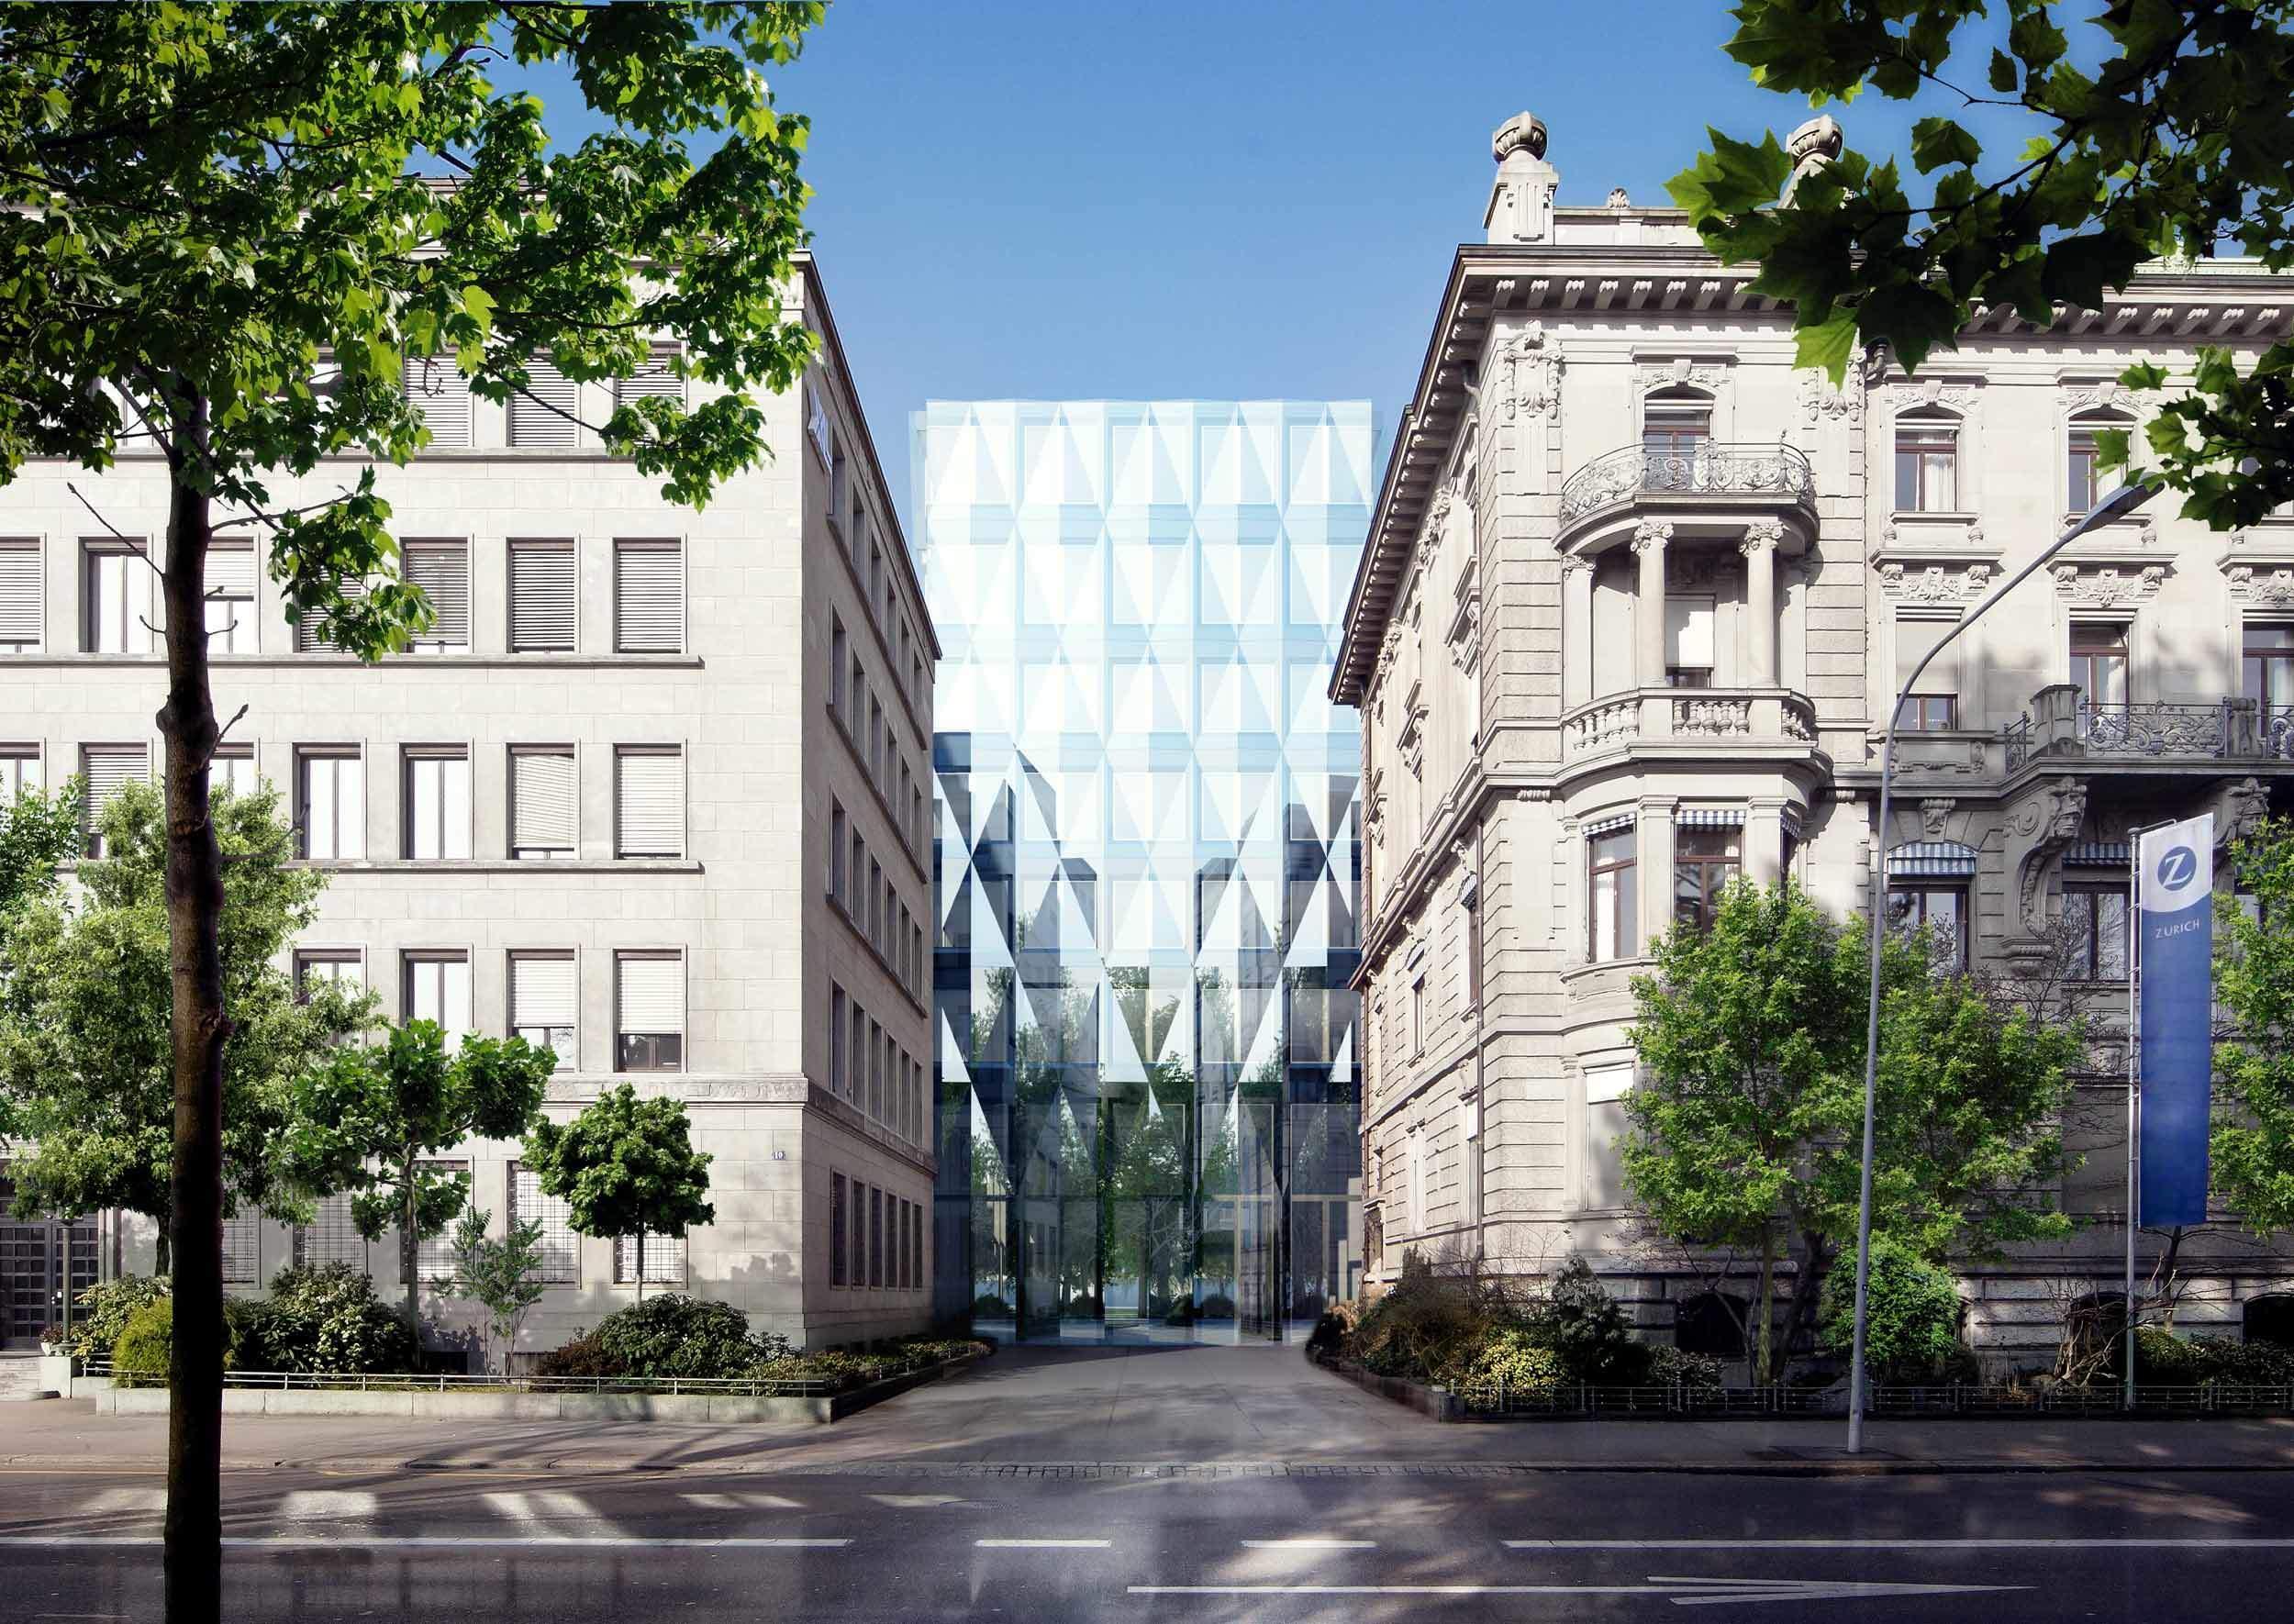 project-quai-zurich-visualization-of-new-headquarter-2